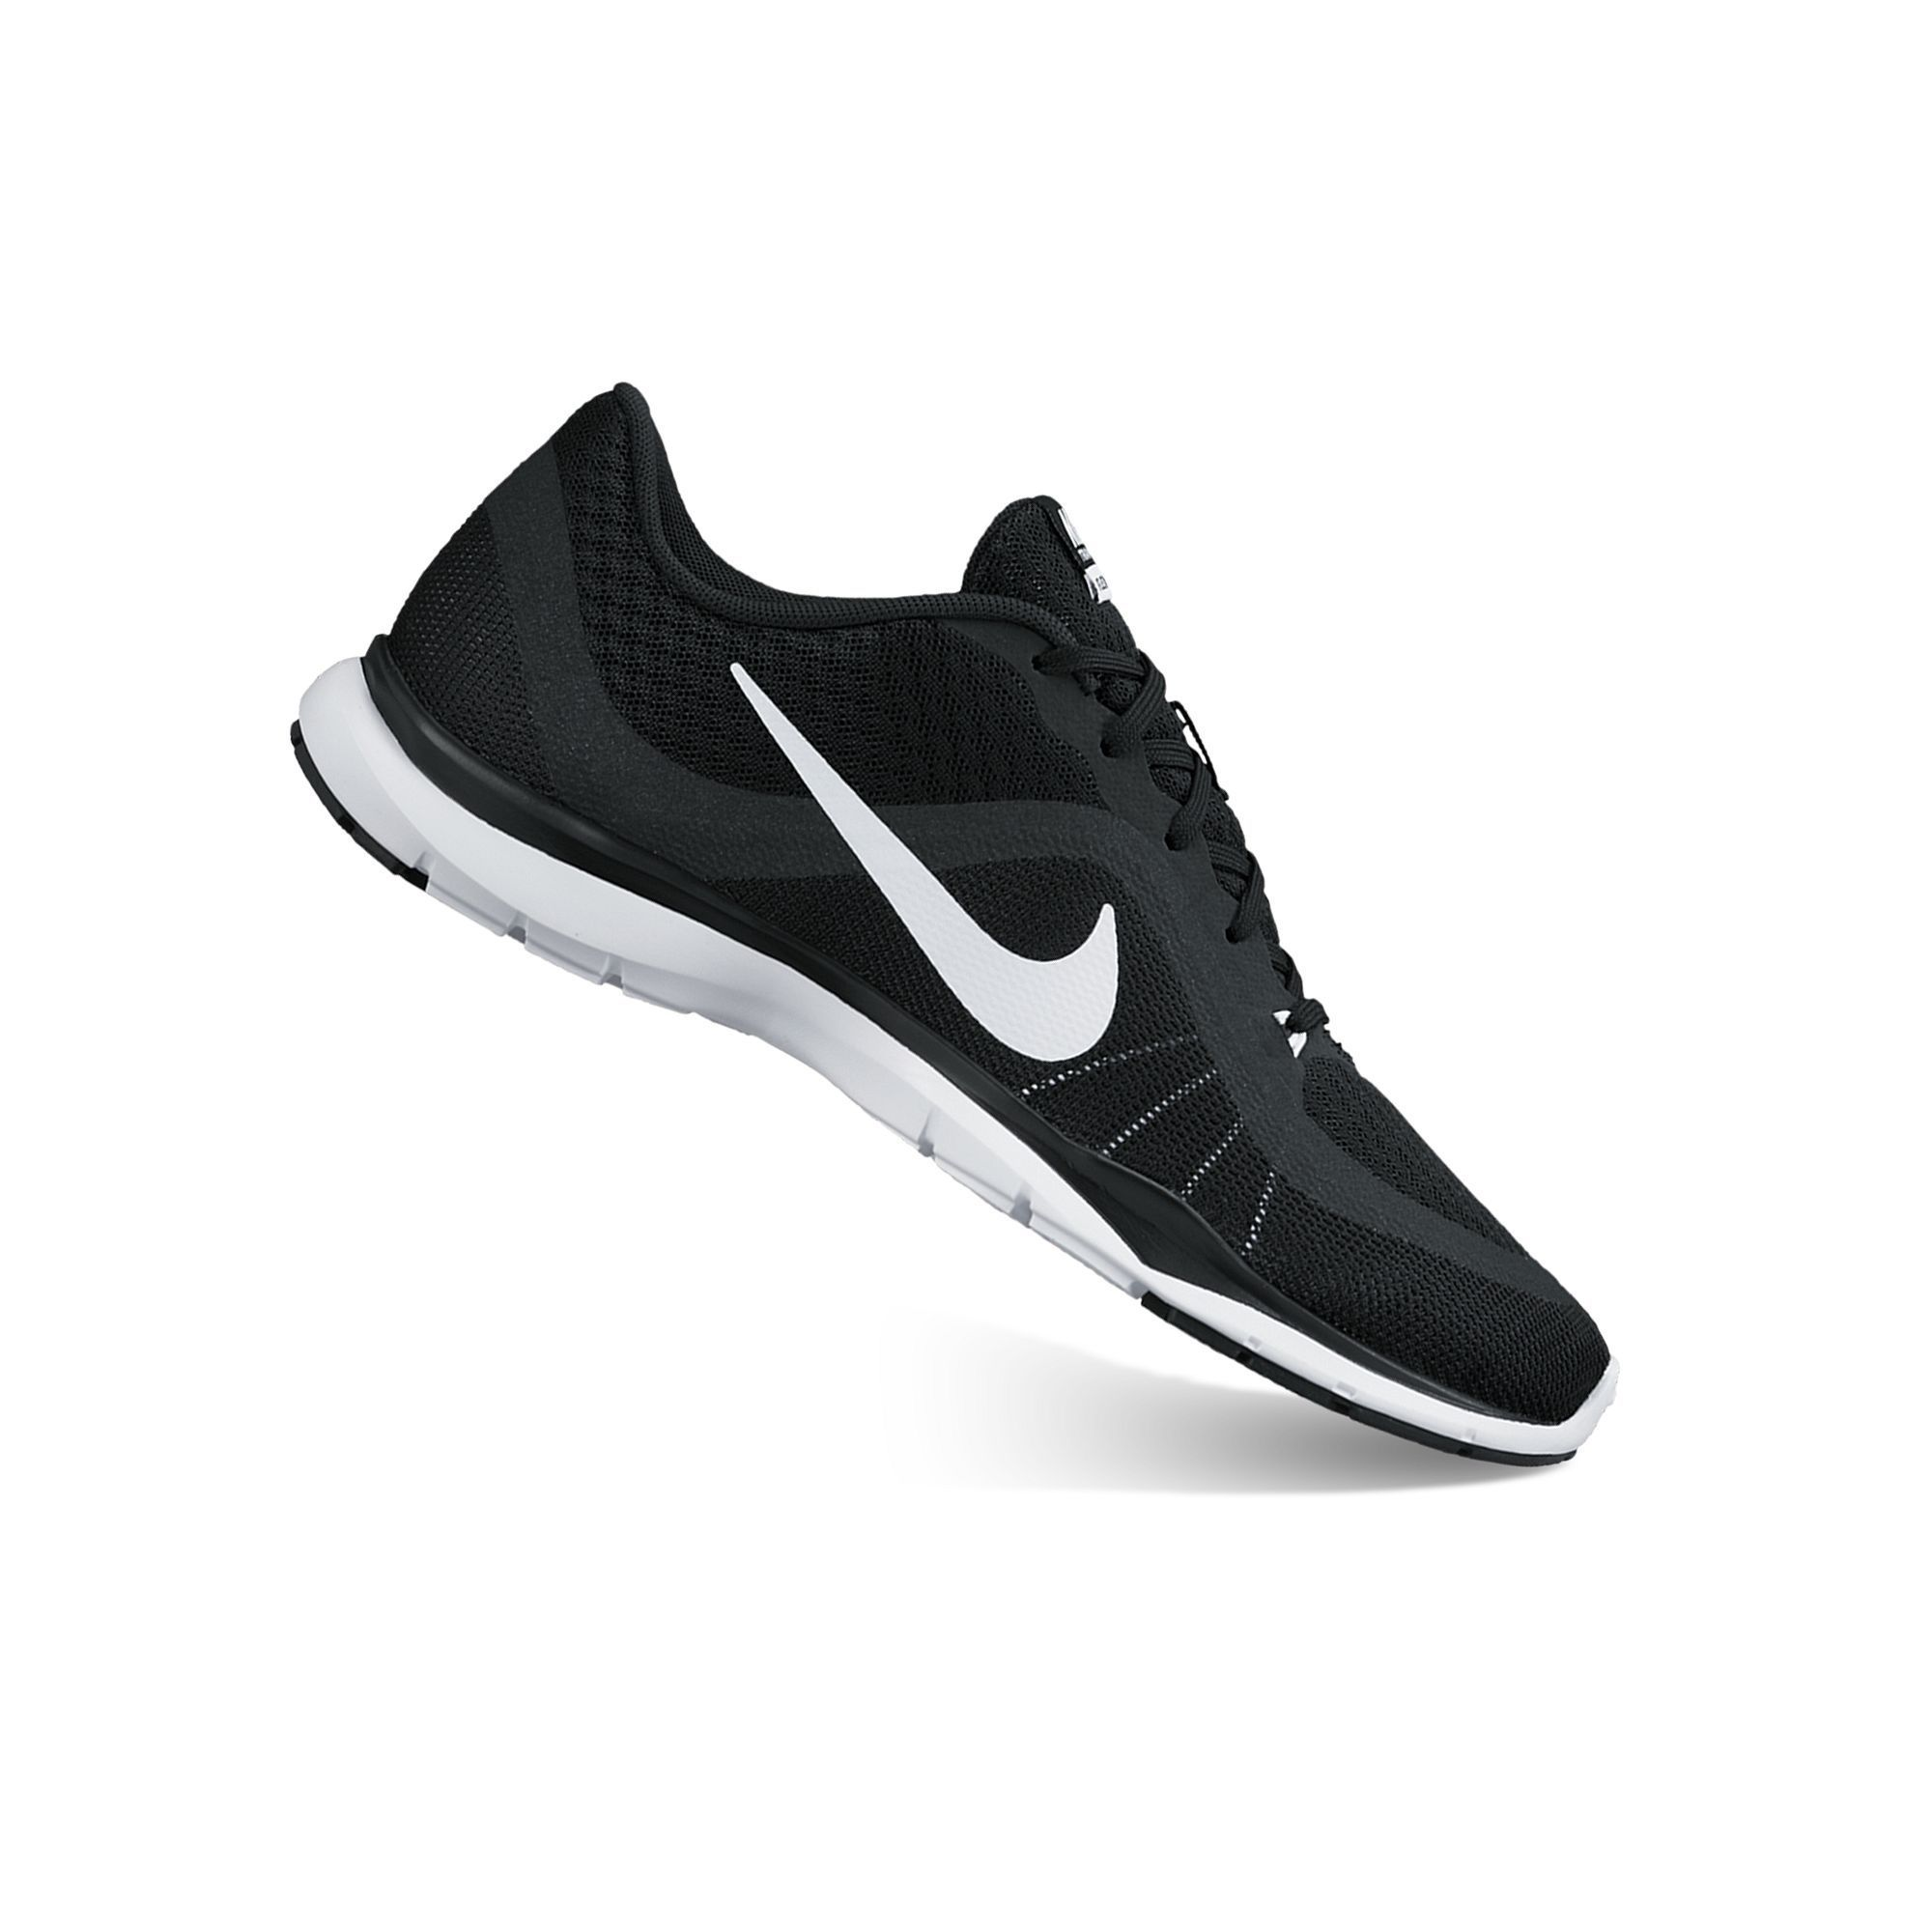 b62e19e98e0b5 Nike Flex Trainer 6 Women s Cross-Training Shoes